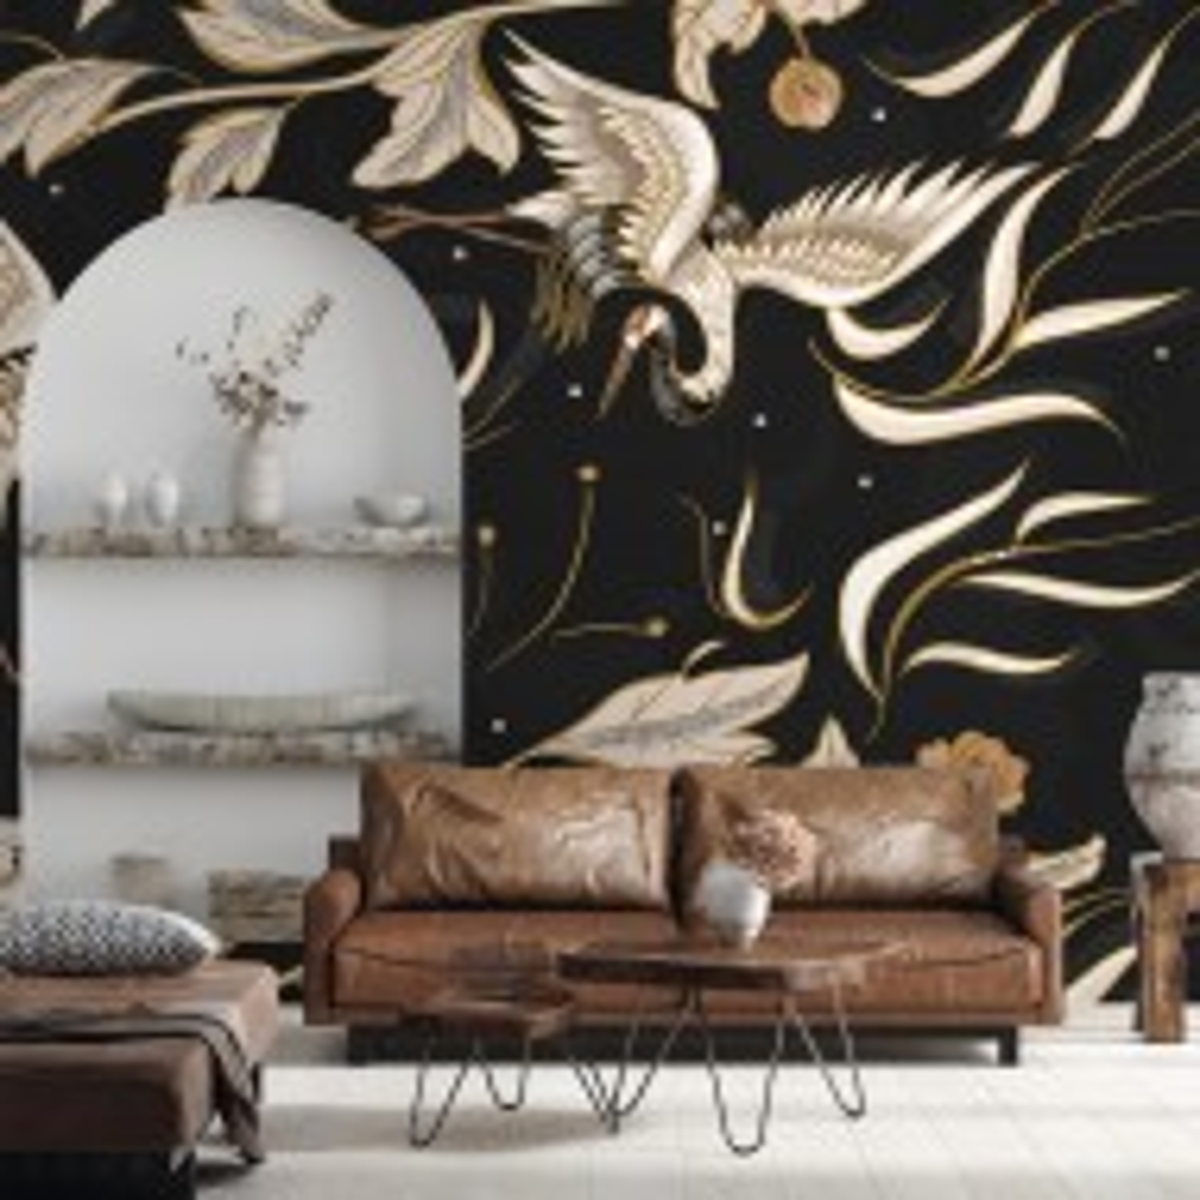 Dark Crane Birds and Brown Retro Florals Wallpaper Mural